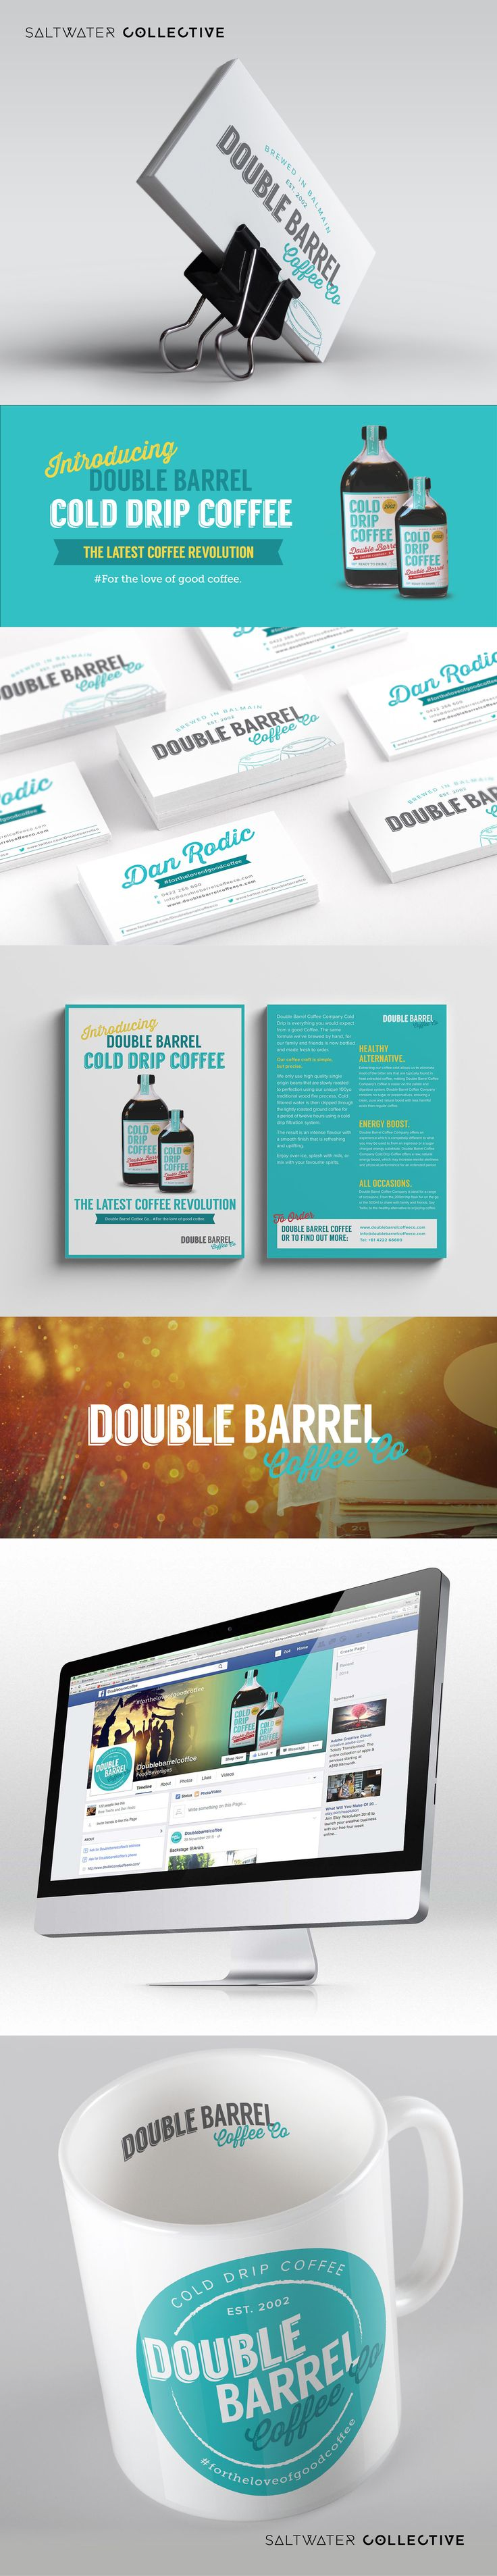 Double Barrel Coffee Company The latest coffee revolution